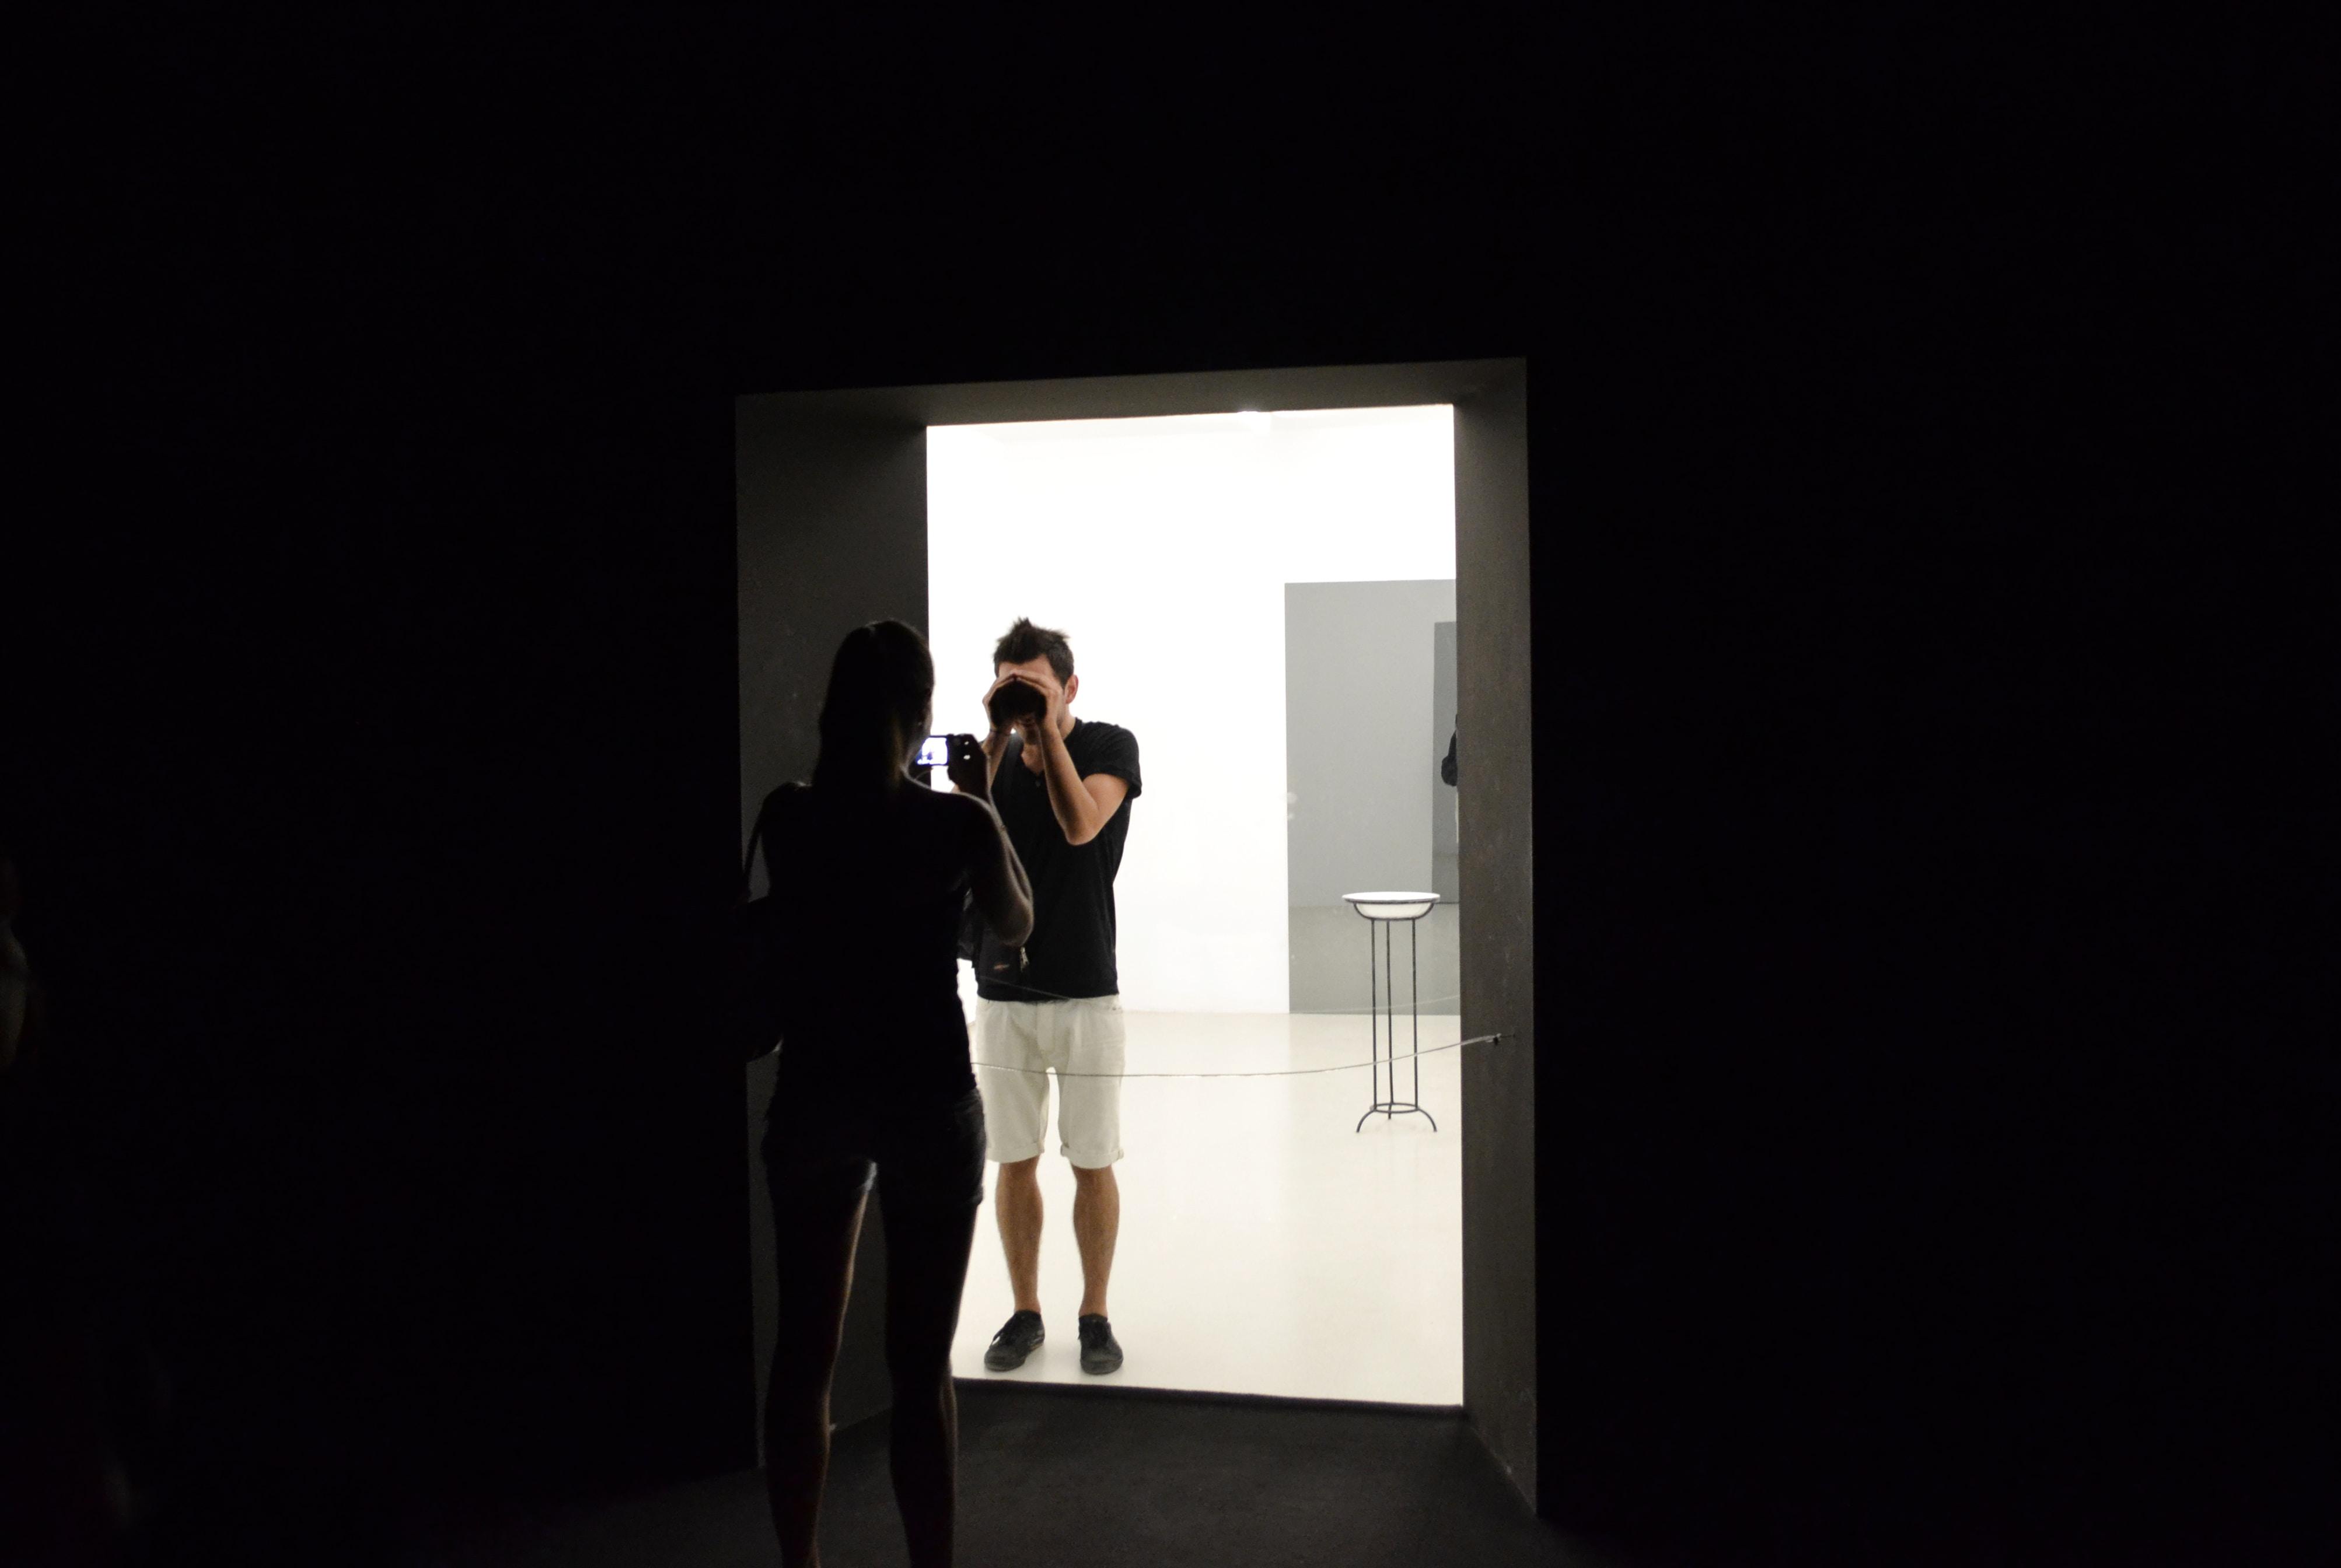 man in black shirt holding camera